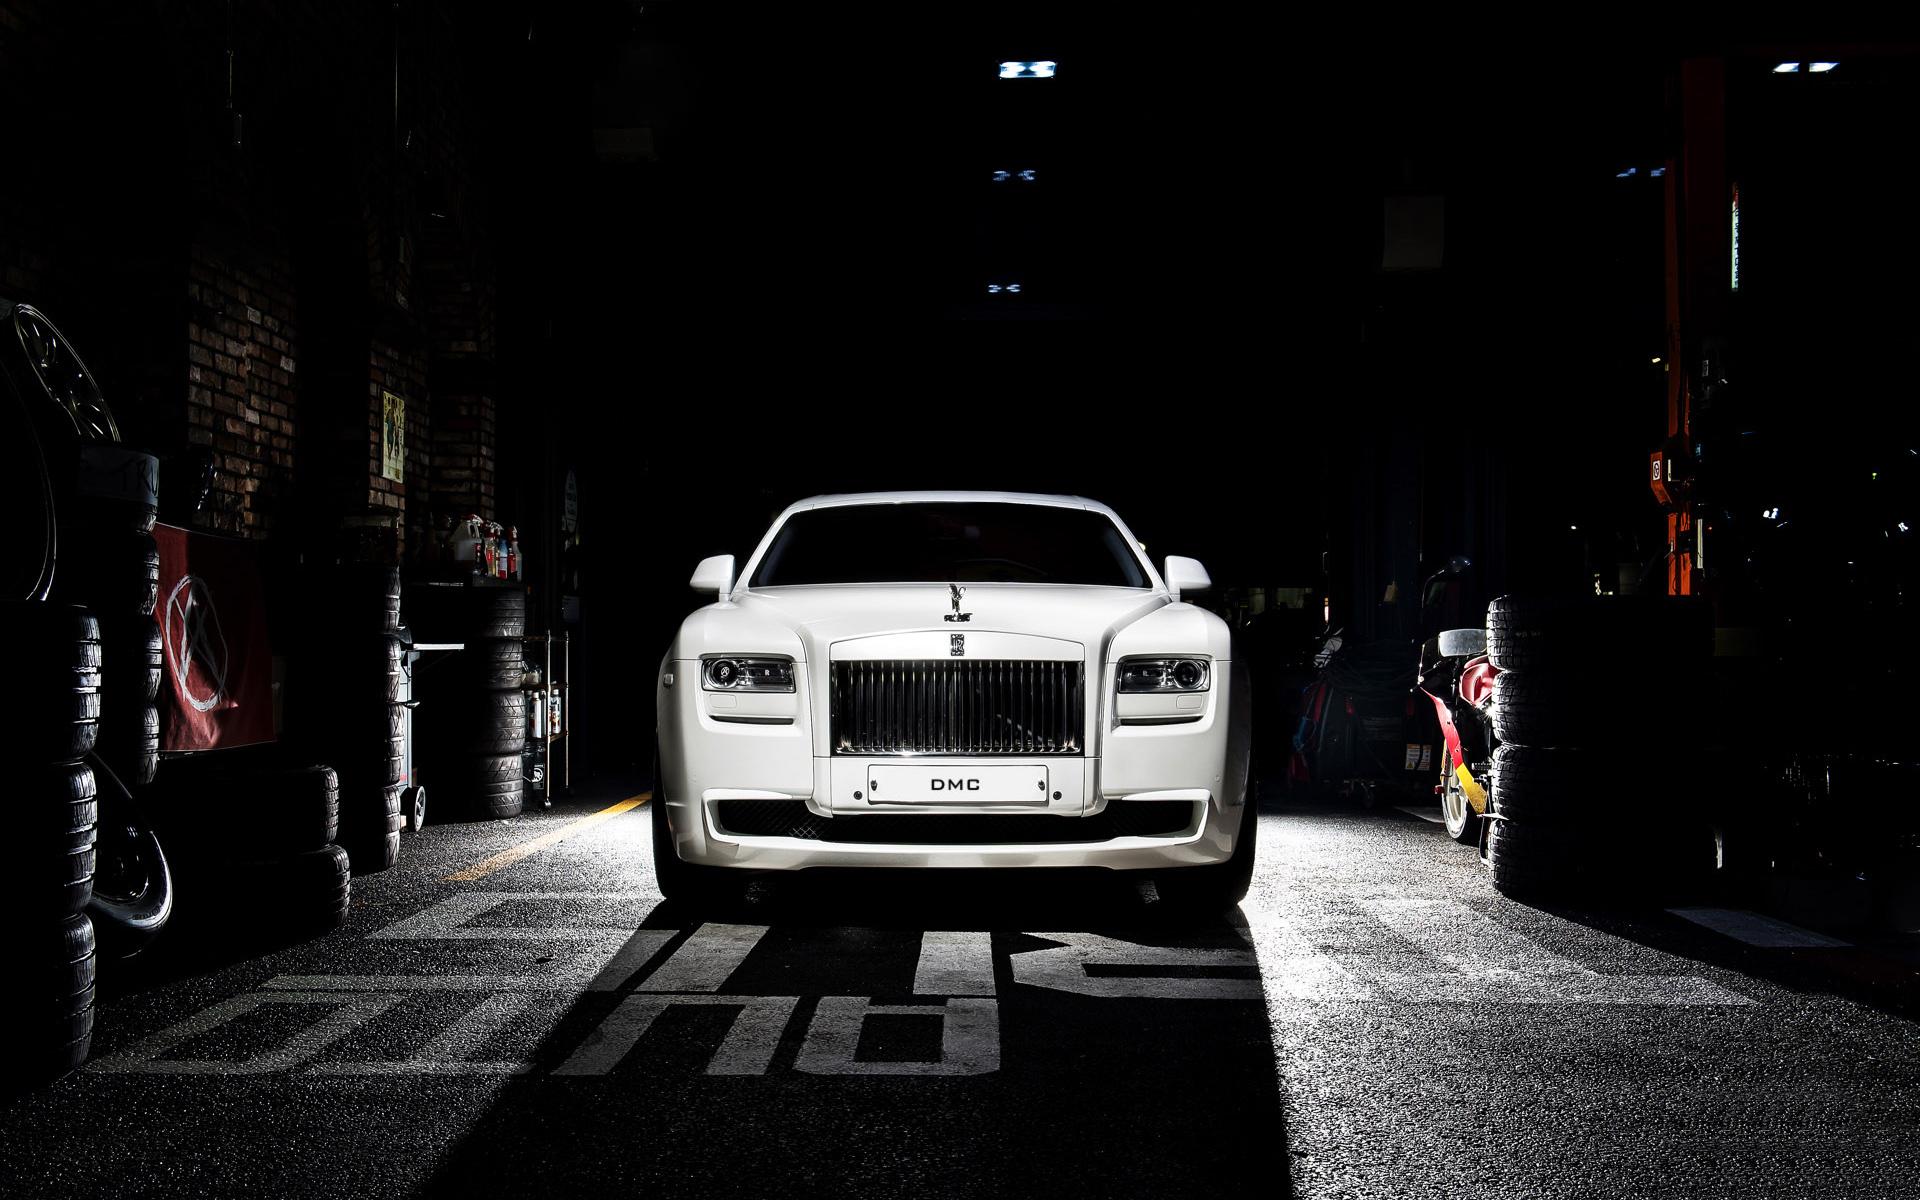 2016 DMC Rolls Royce Ghost SaRangHae Wallpaper | HD Car Wallpapers